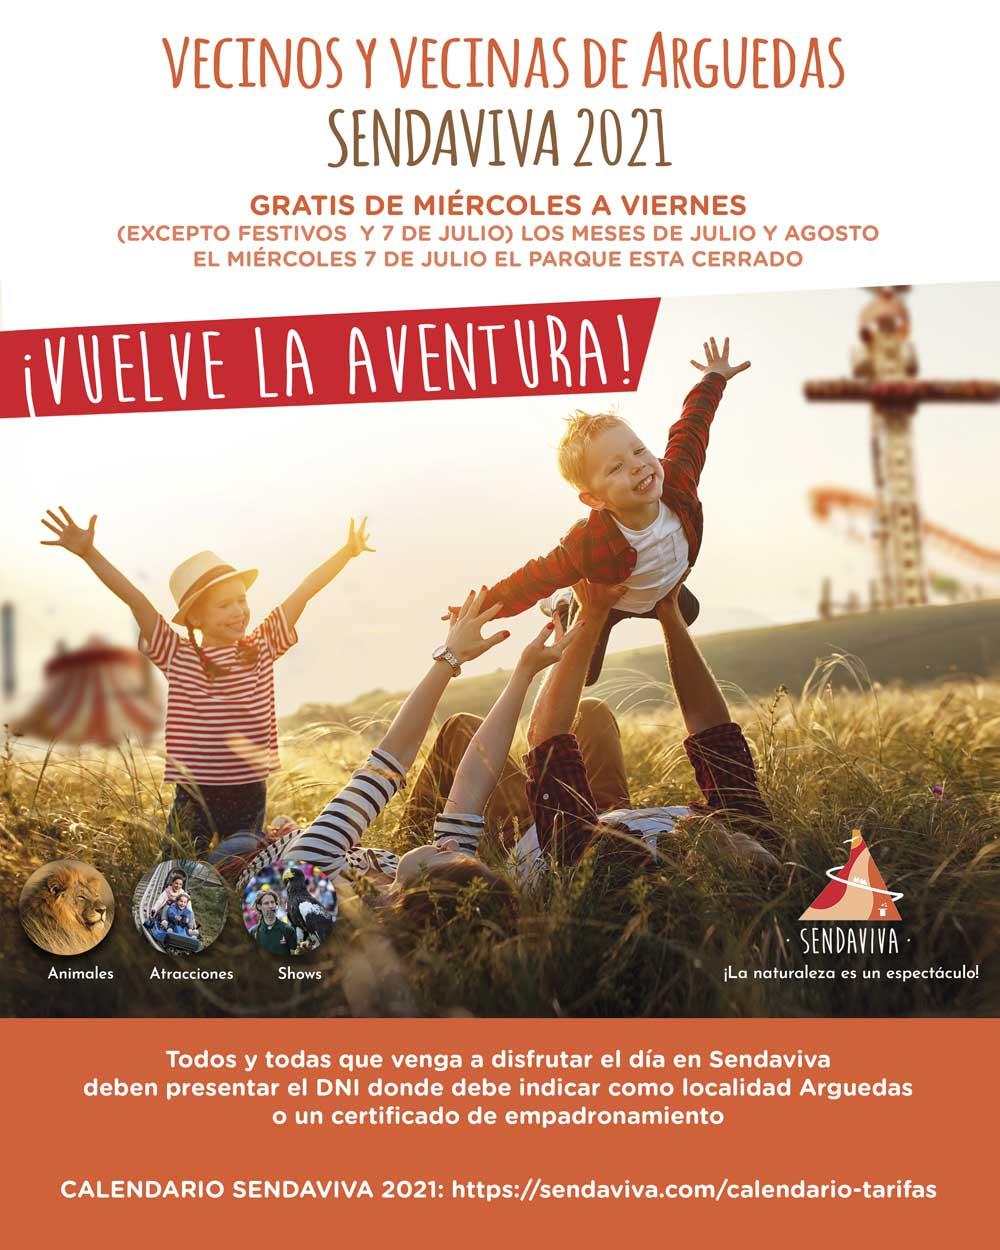 Sendaviva-Arguedas-2021-WEB